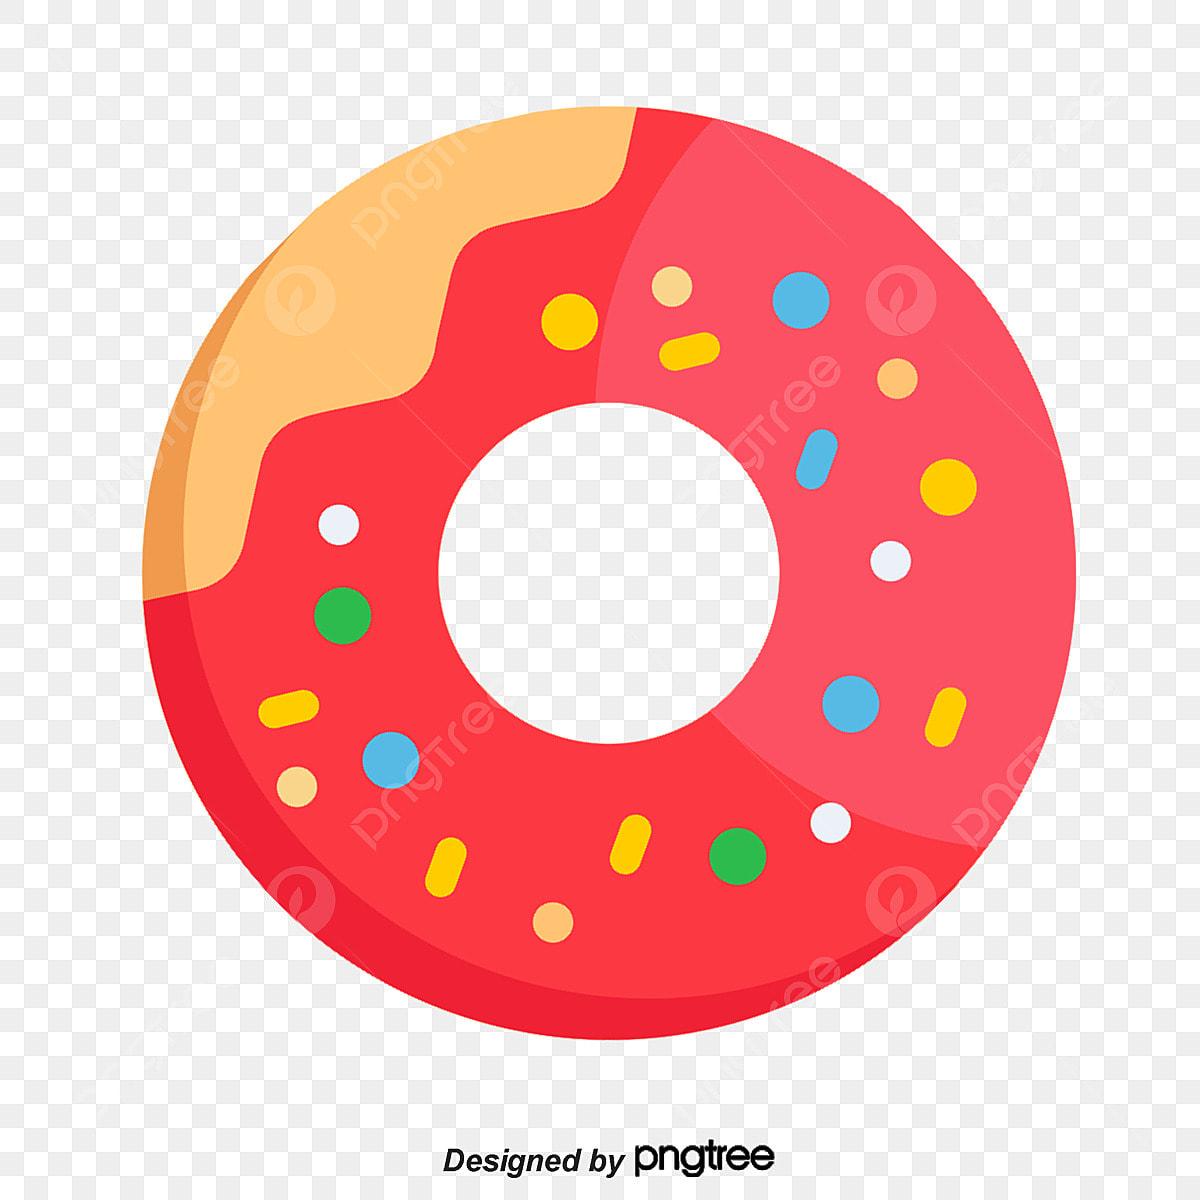 Delicieux Delicieux Donuts Dessin Delicieux Delicieux Png Et